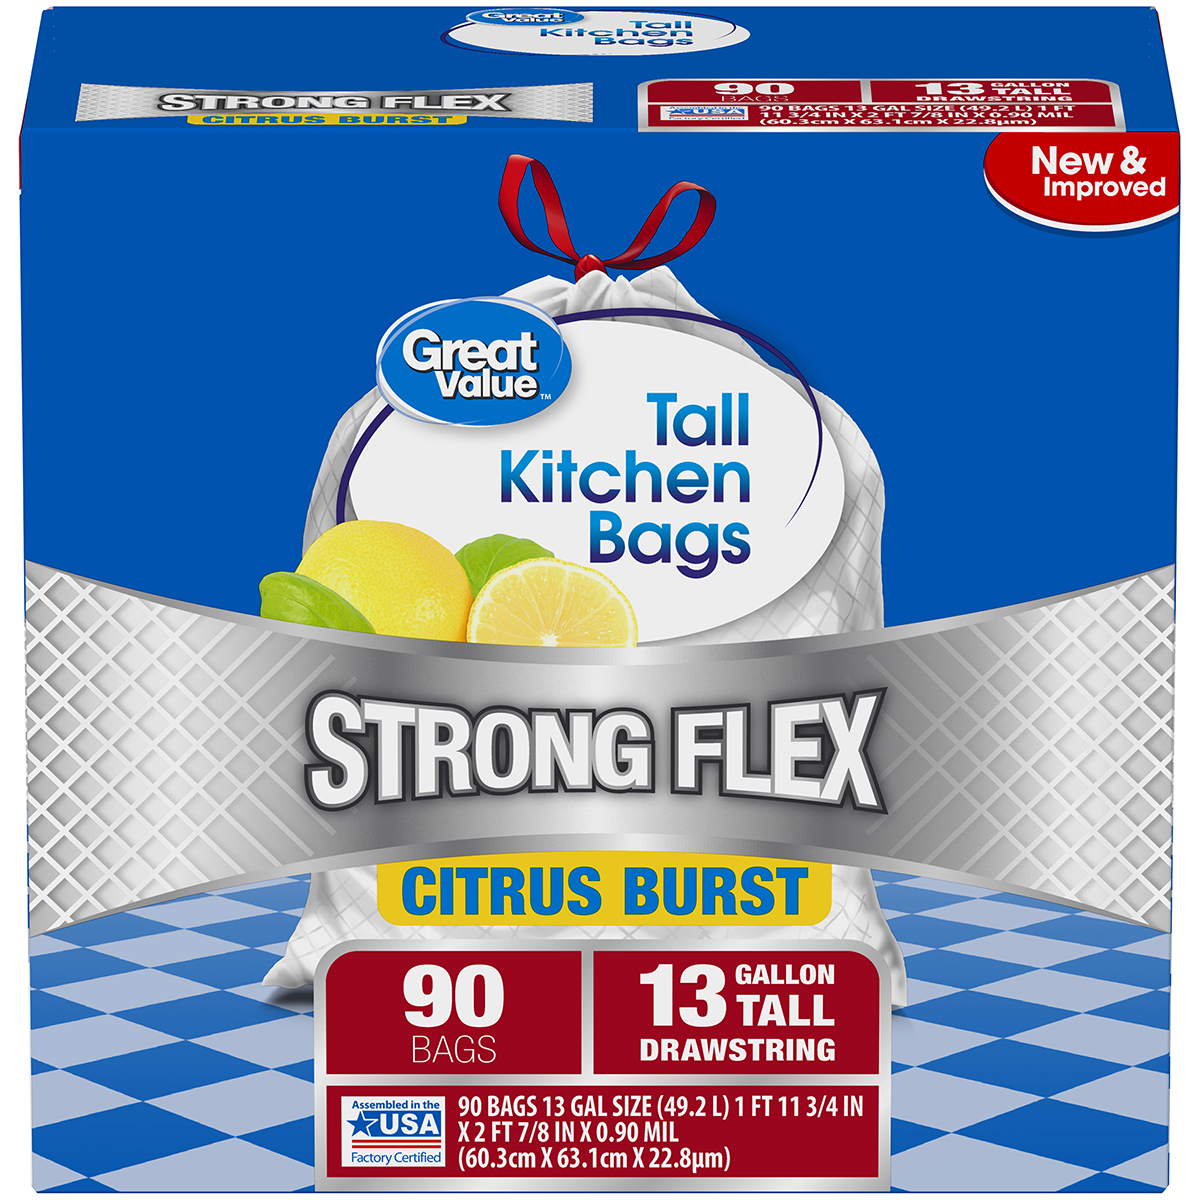 Great Value Strong Flex Tall Kitchen Drawstring Trash Bags, Citrus Burst, 13 Gallon, 90 Count